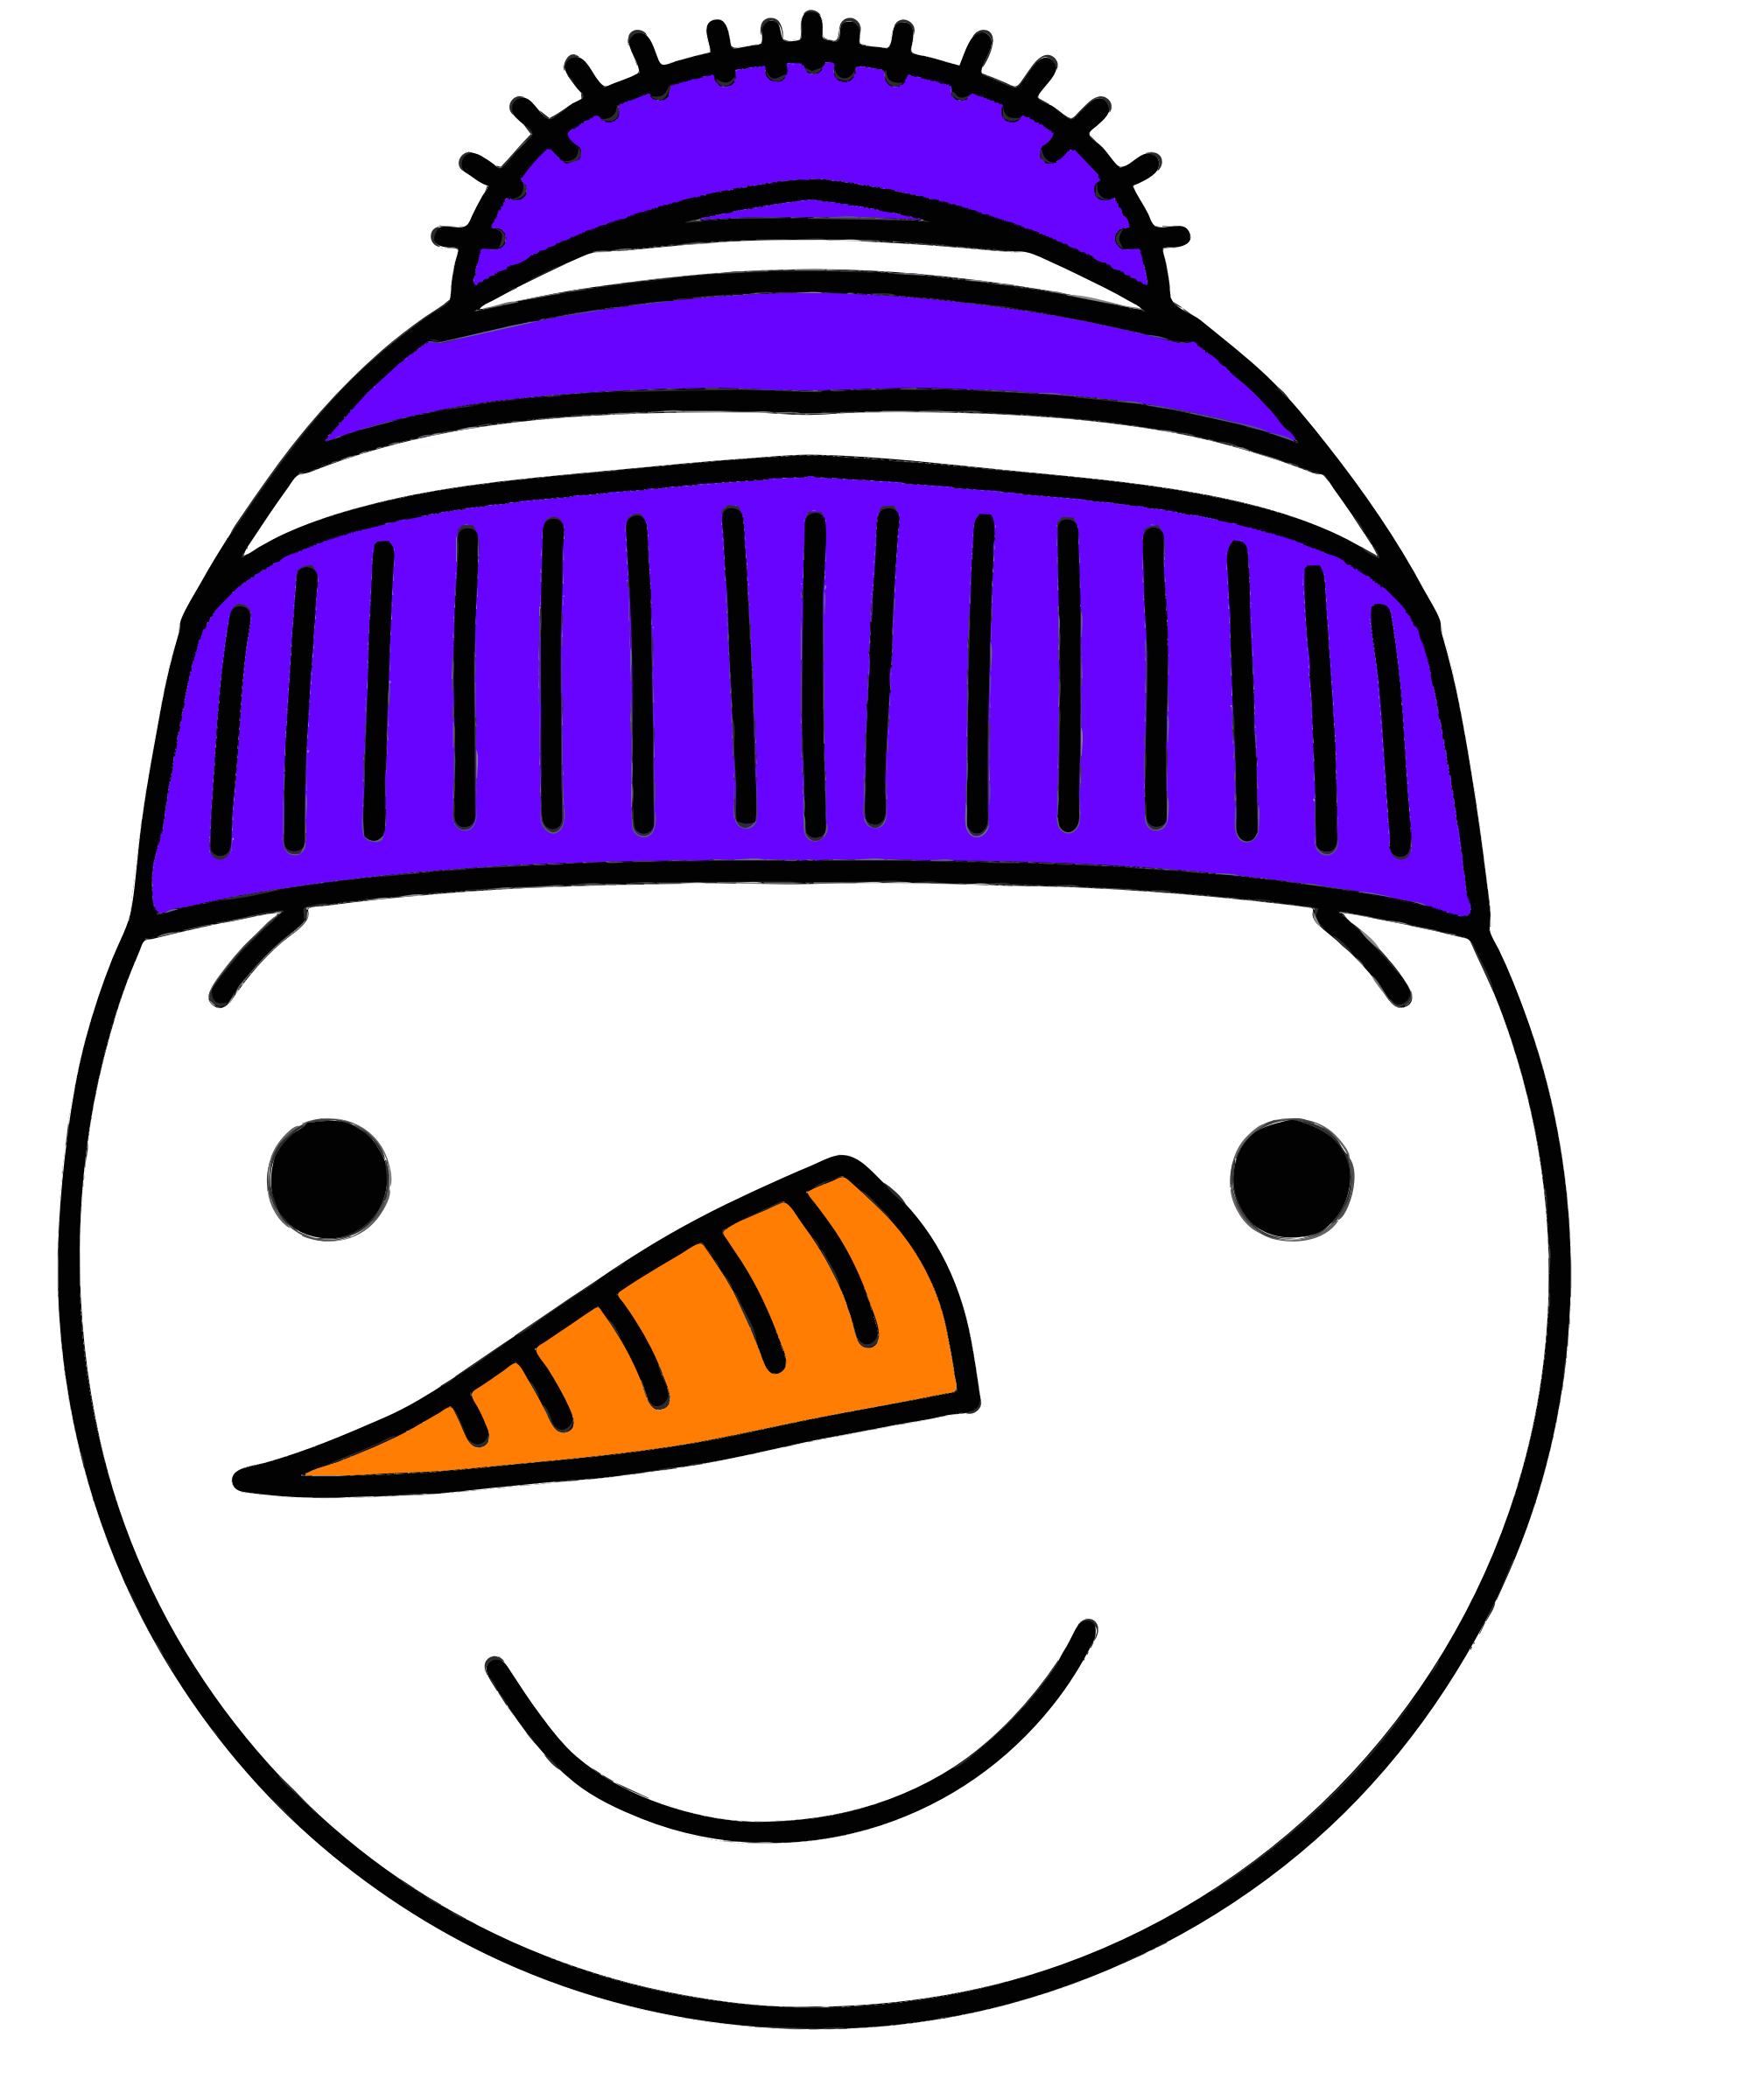 Clipart - snowman scene 10